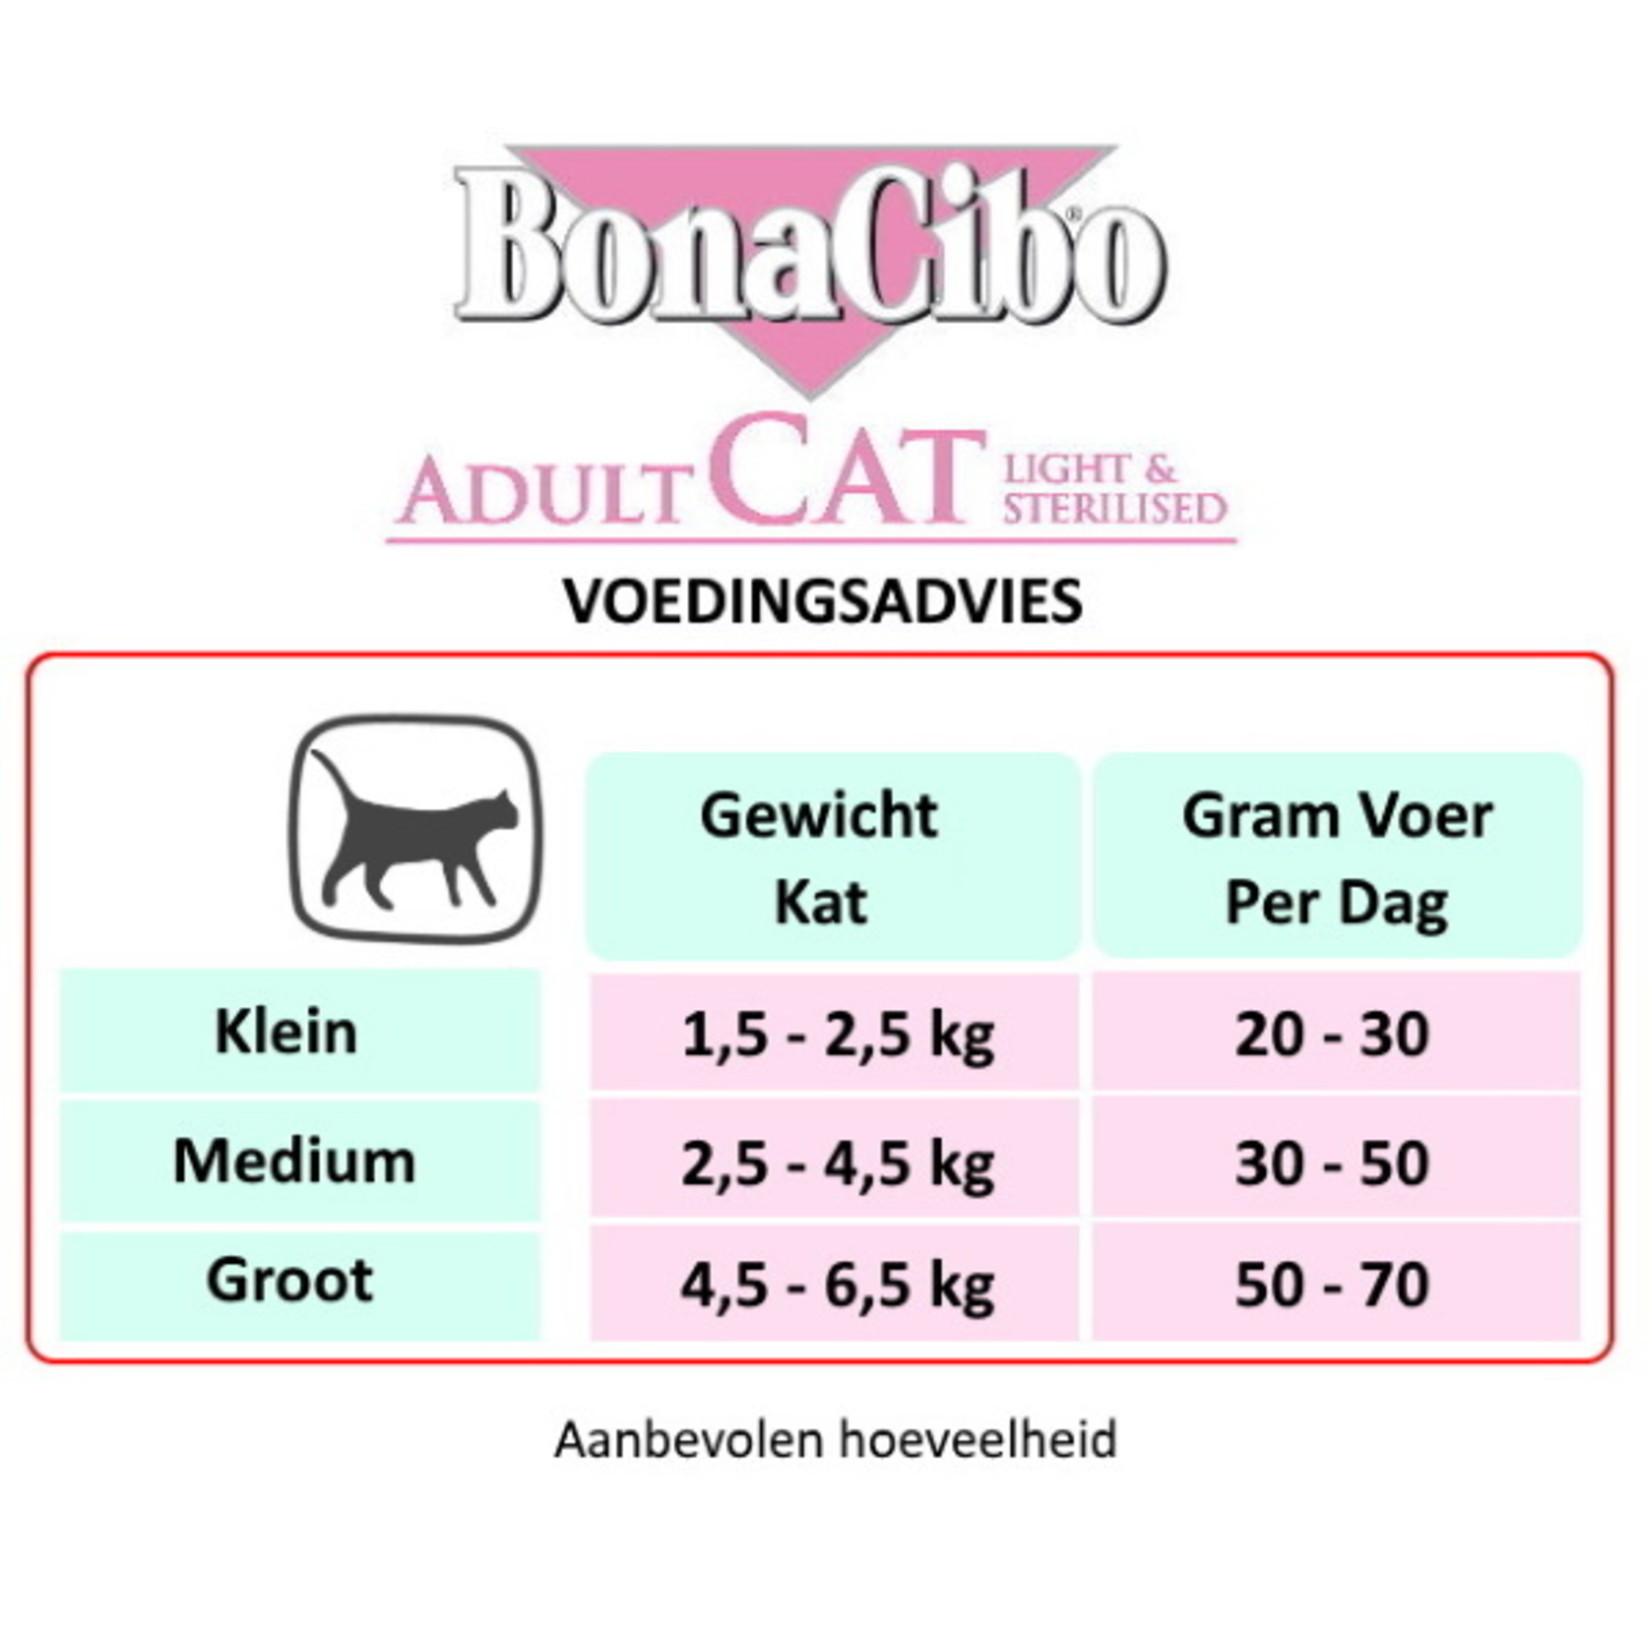 Bonacibo Bonacibo Cat Light & Sterilised Super | Kattenvoer